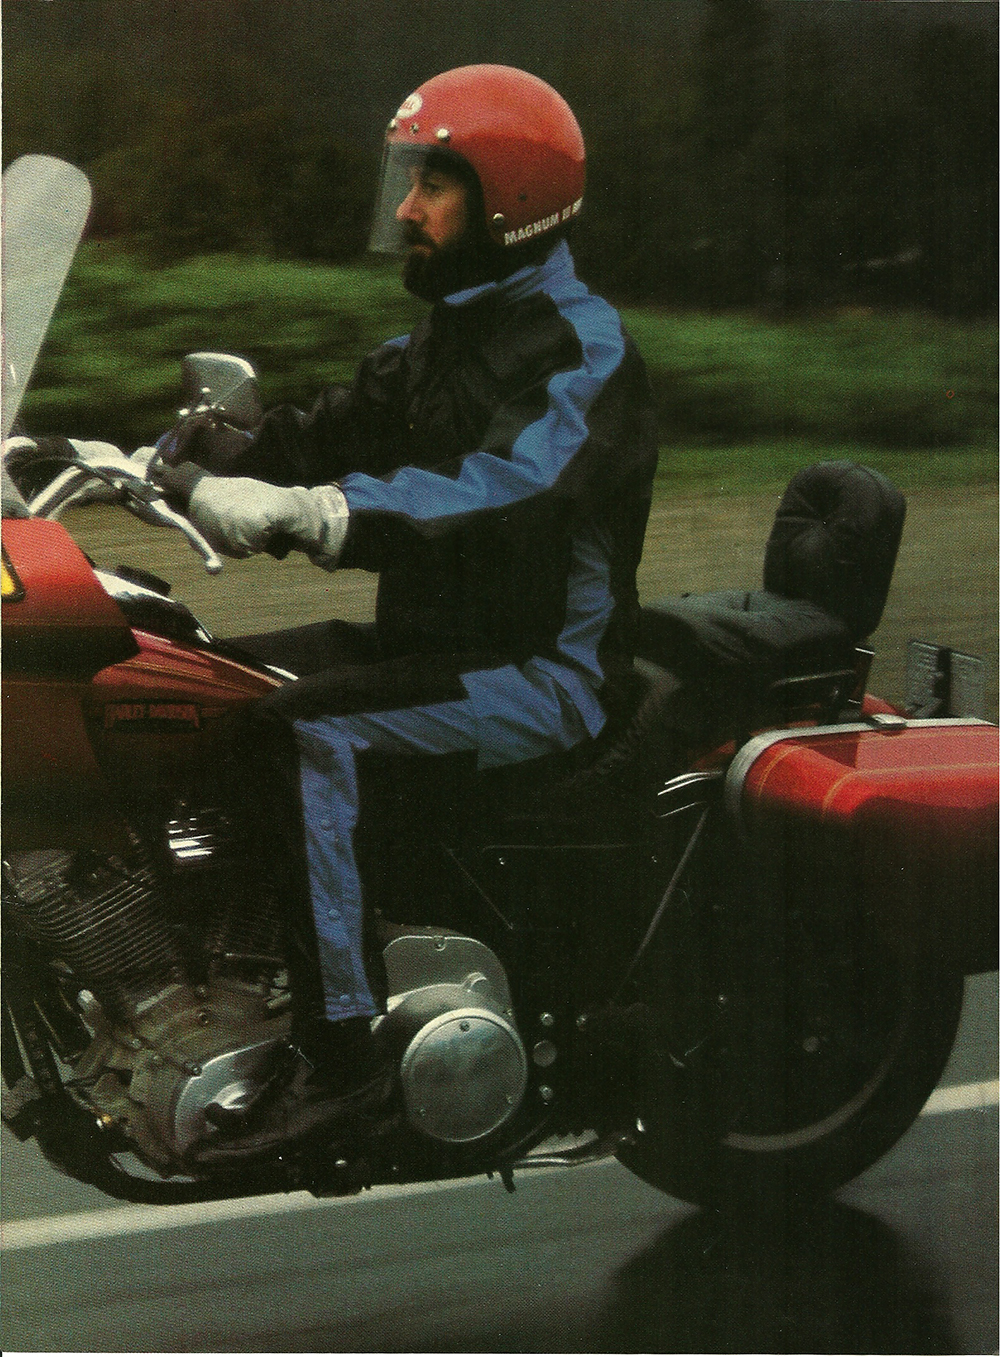 1983 Harley Davidson FXRT Sport Glide road test 2.jpg